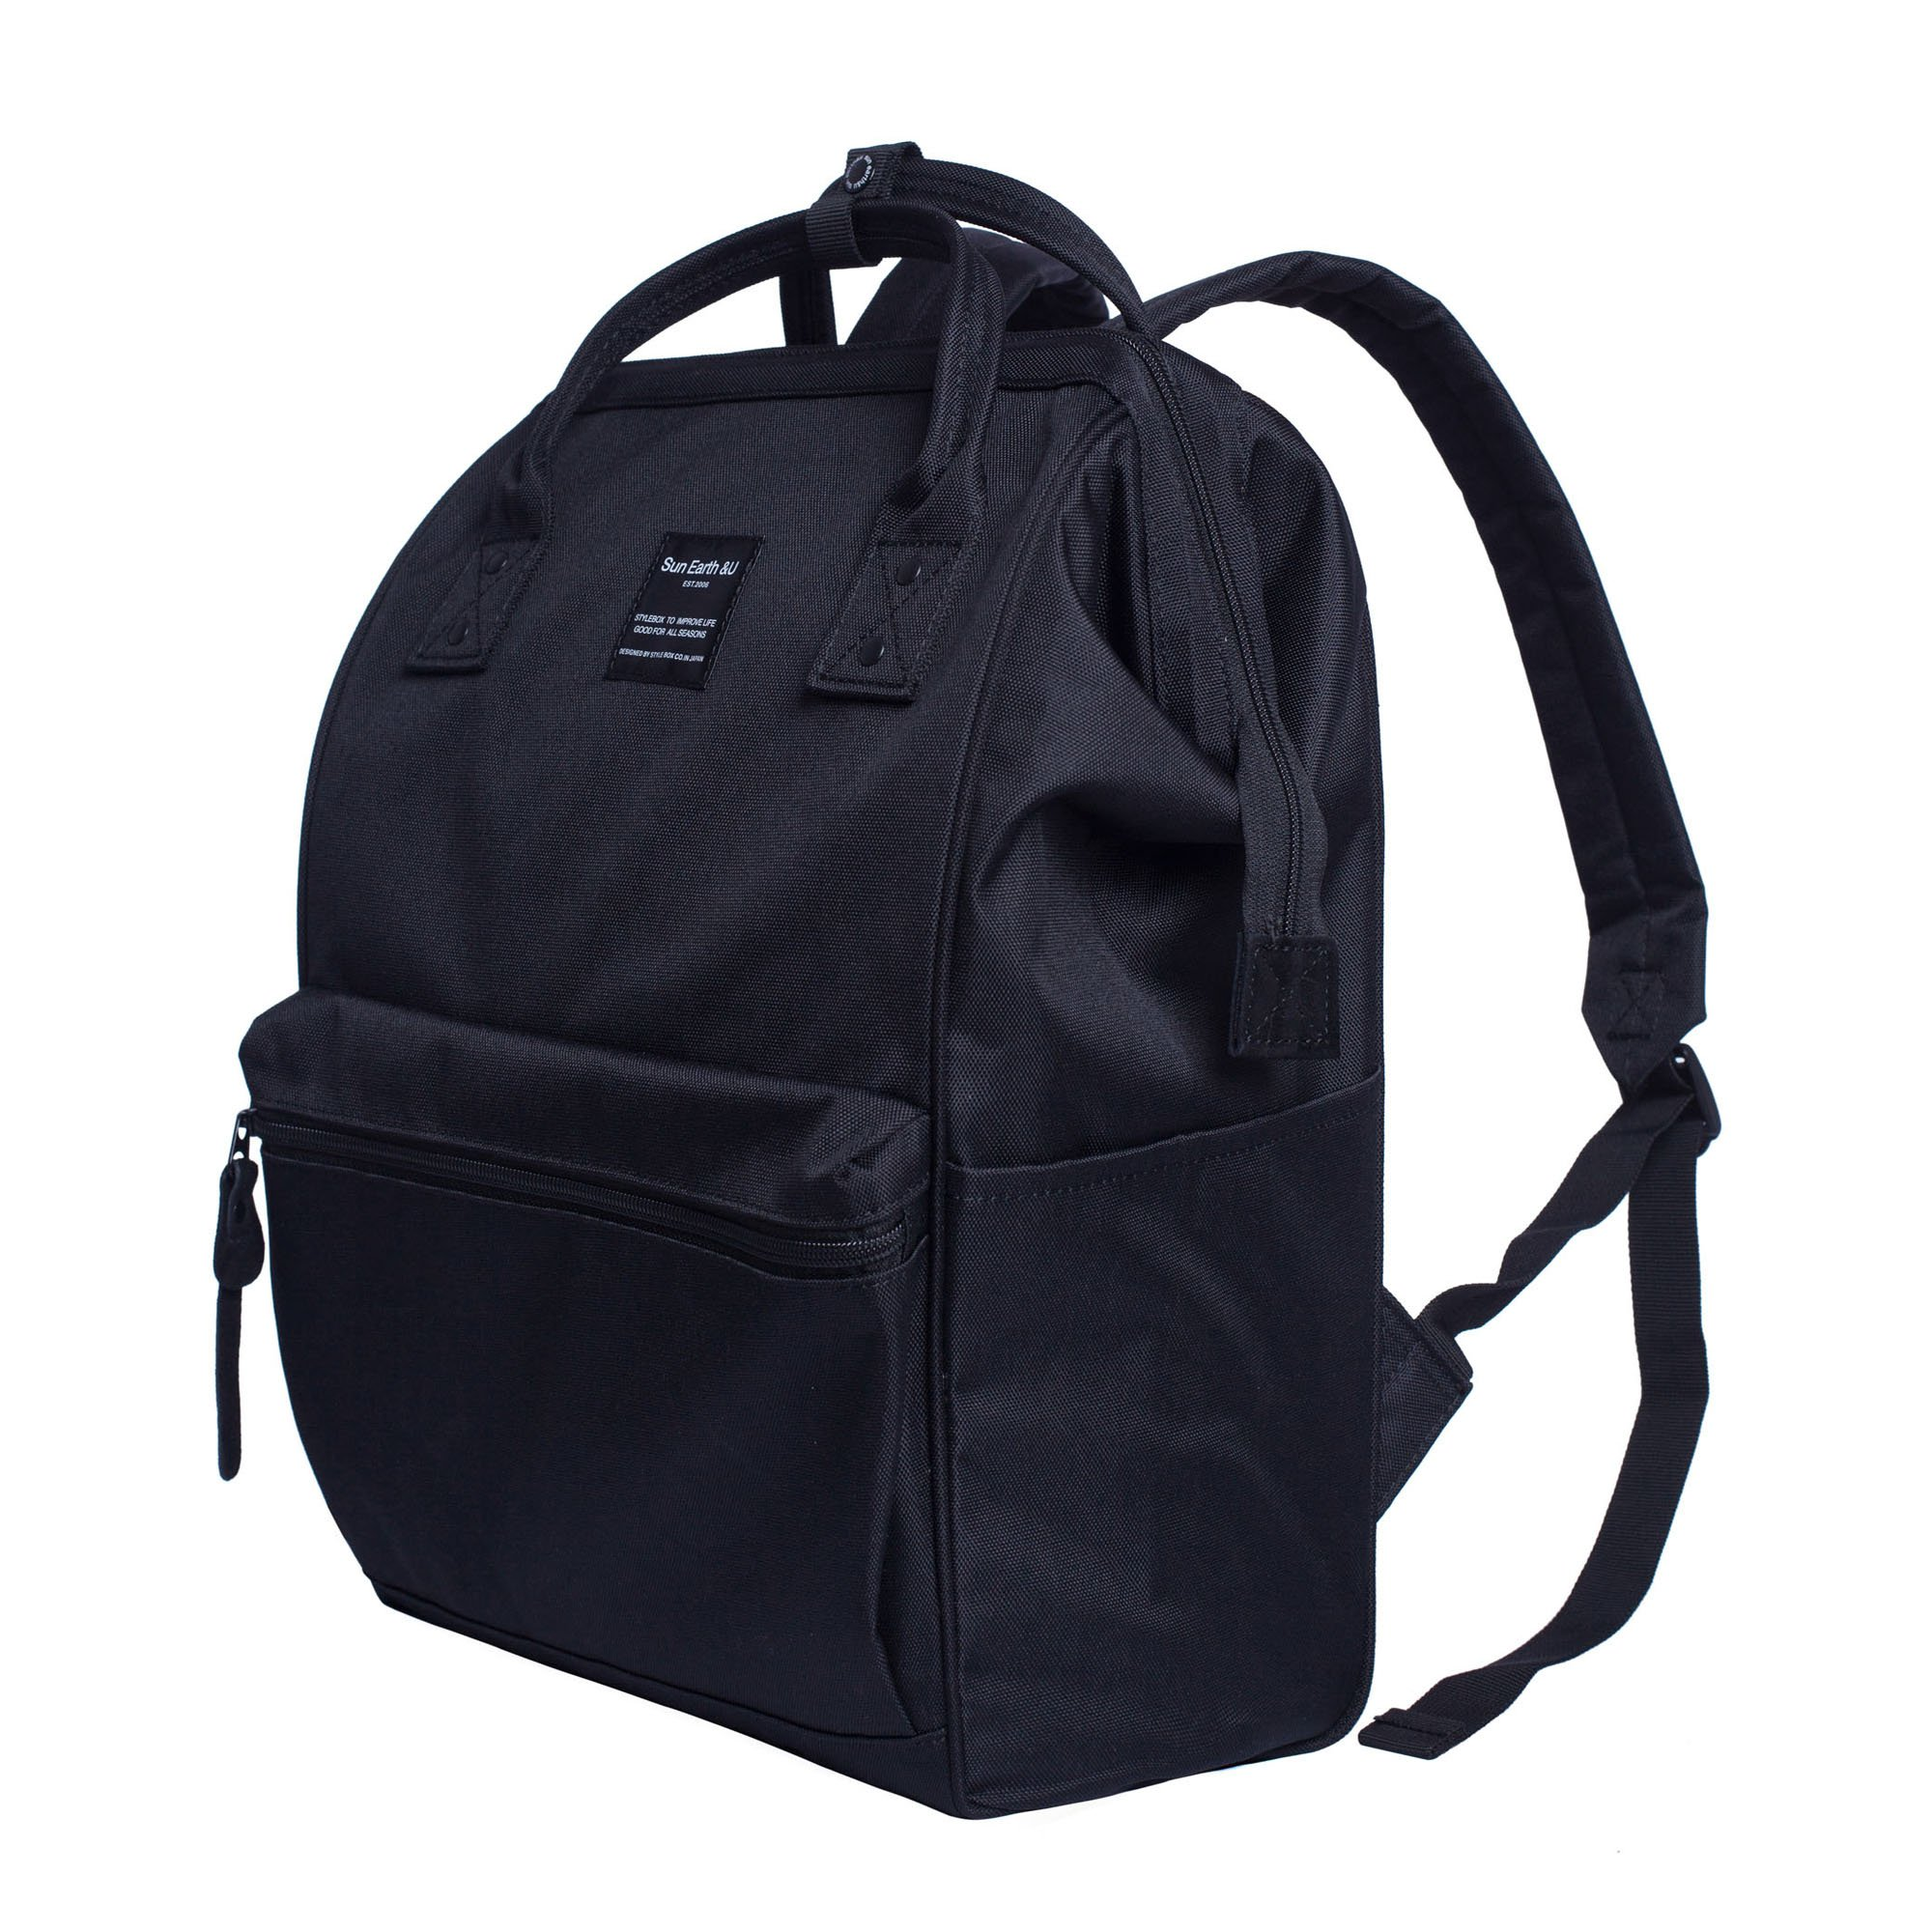 Canvas School Backpack, Waterproof College Laptop Bookbag, Wide Opening Large Capacity Big Student Bag, Multi-Functional Travel Backpack for Men and Women-Black